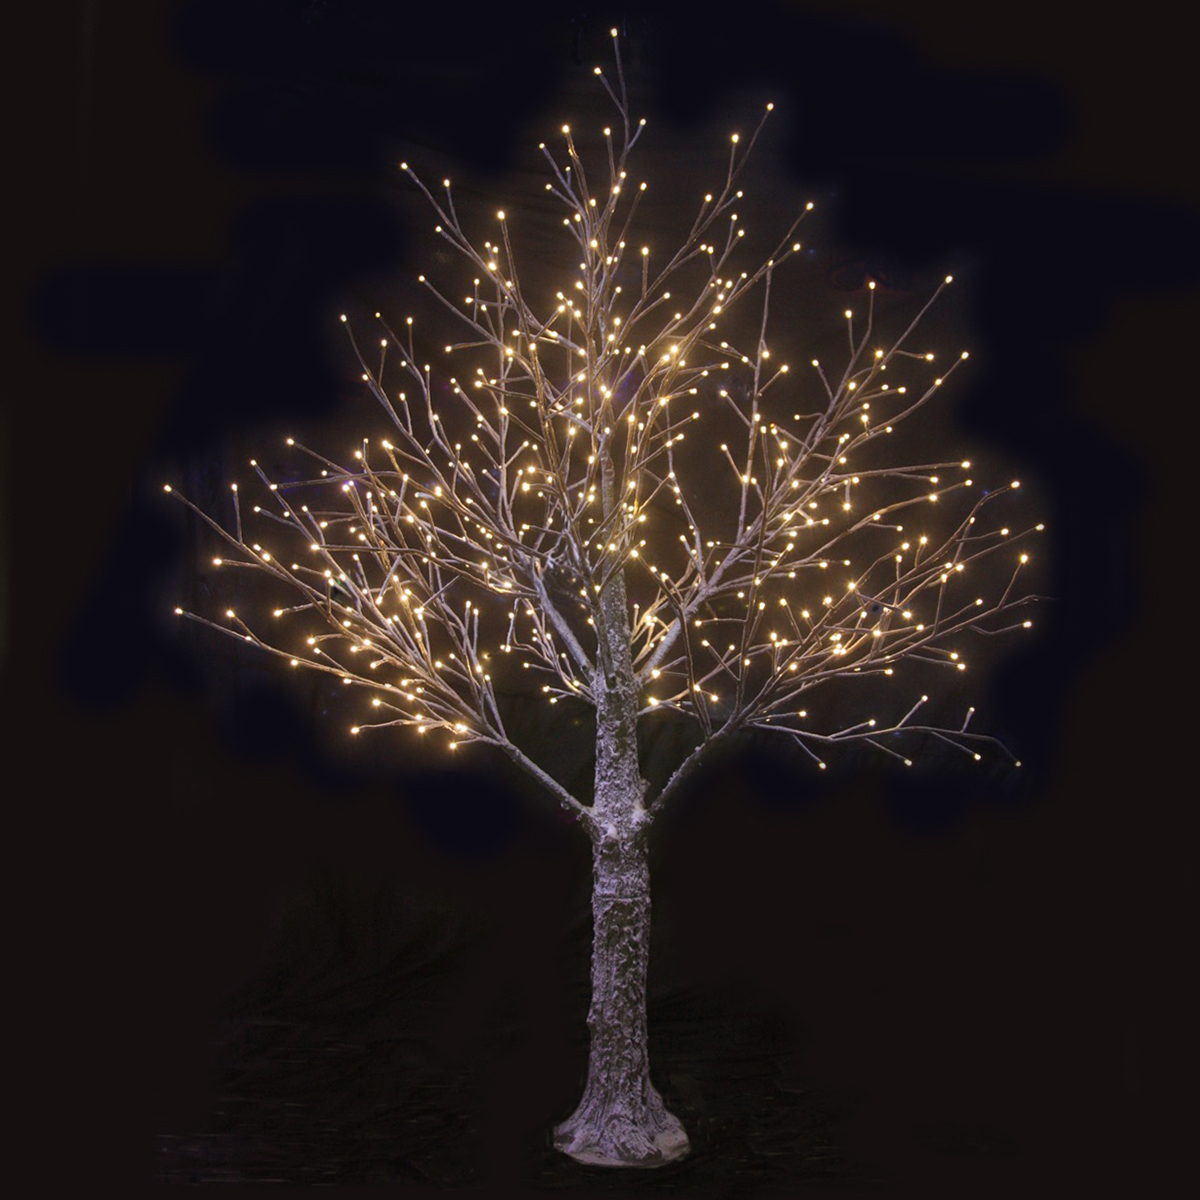 Brown Snowy Twig Tree Warm White LED Lights Christmas